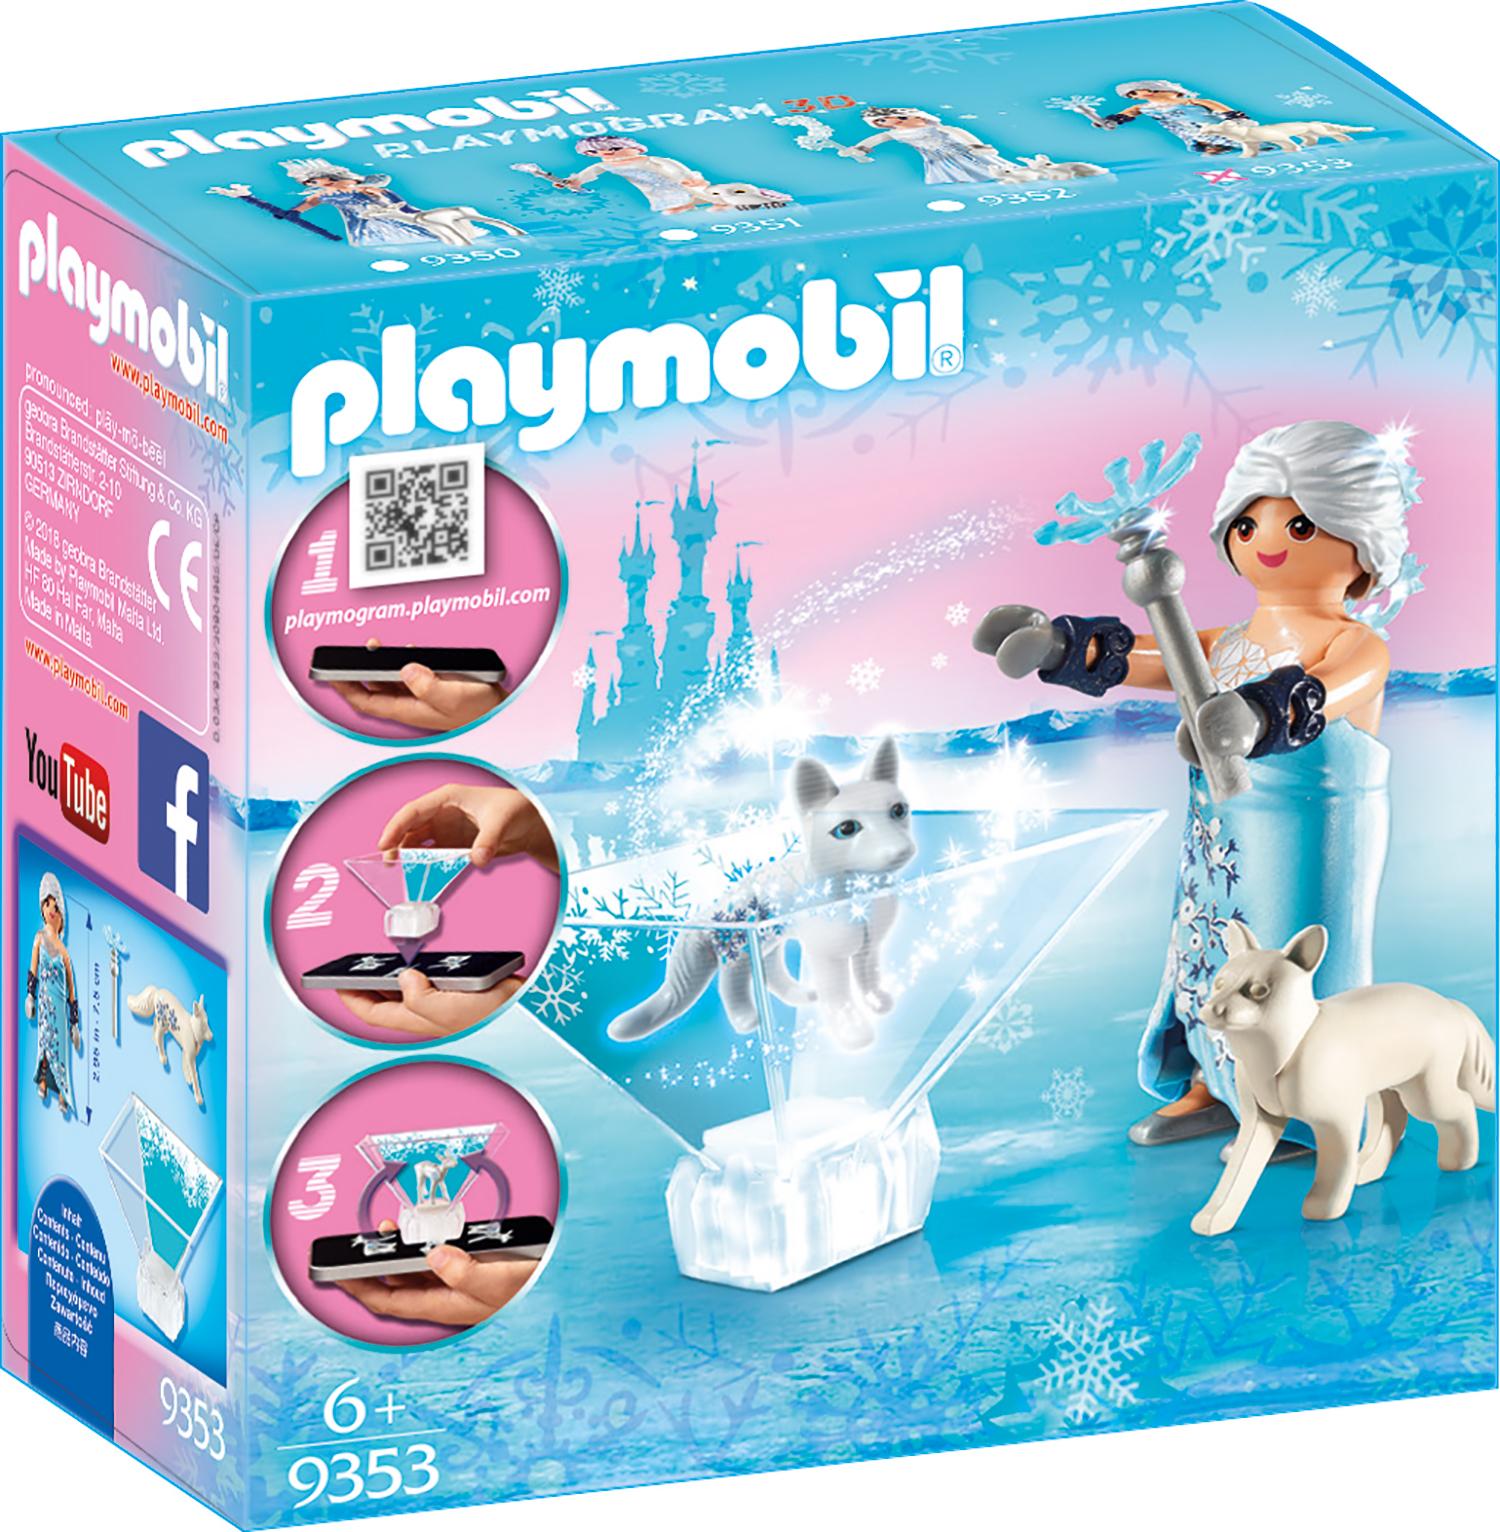 Printesa florilor de iarna playmobil magic